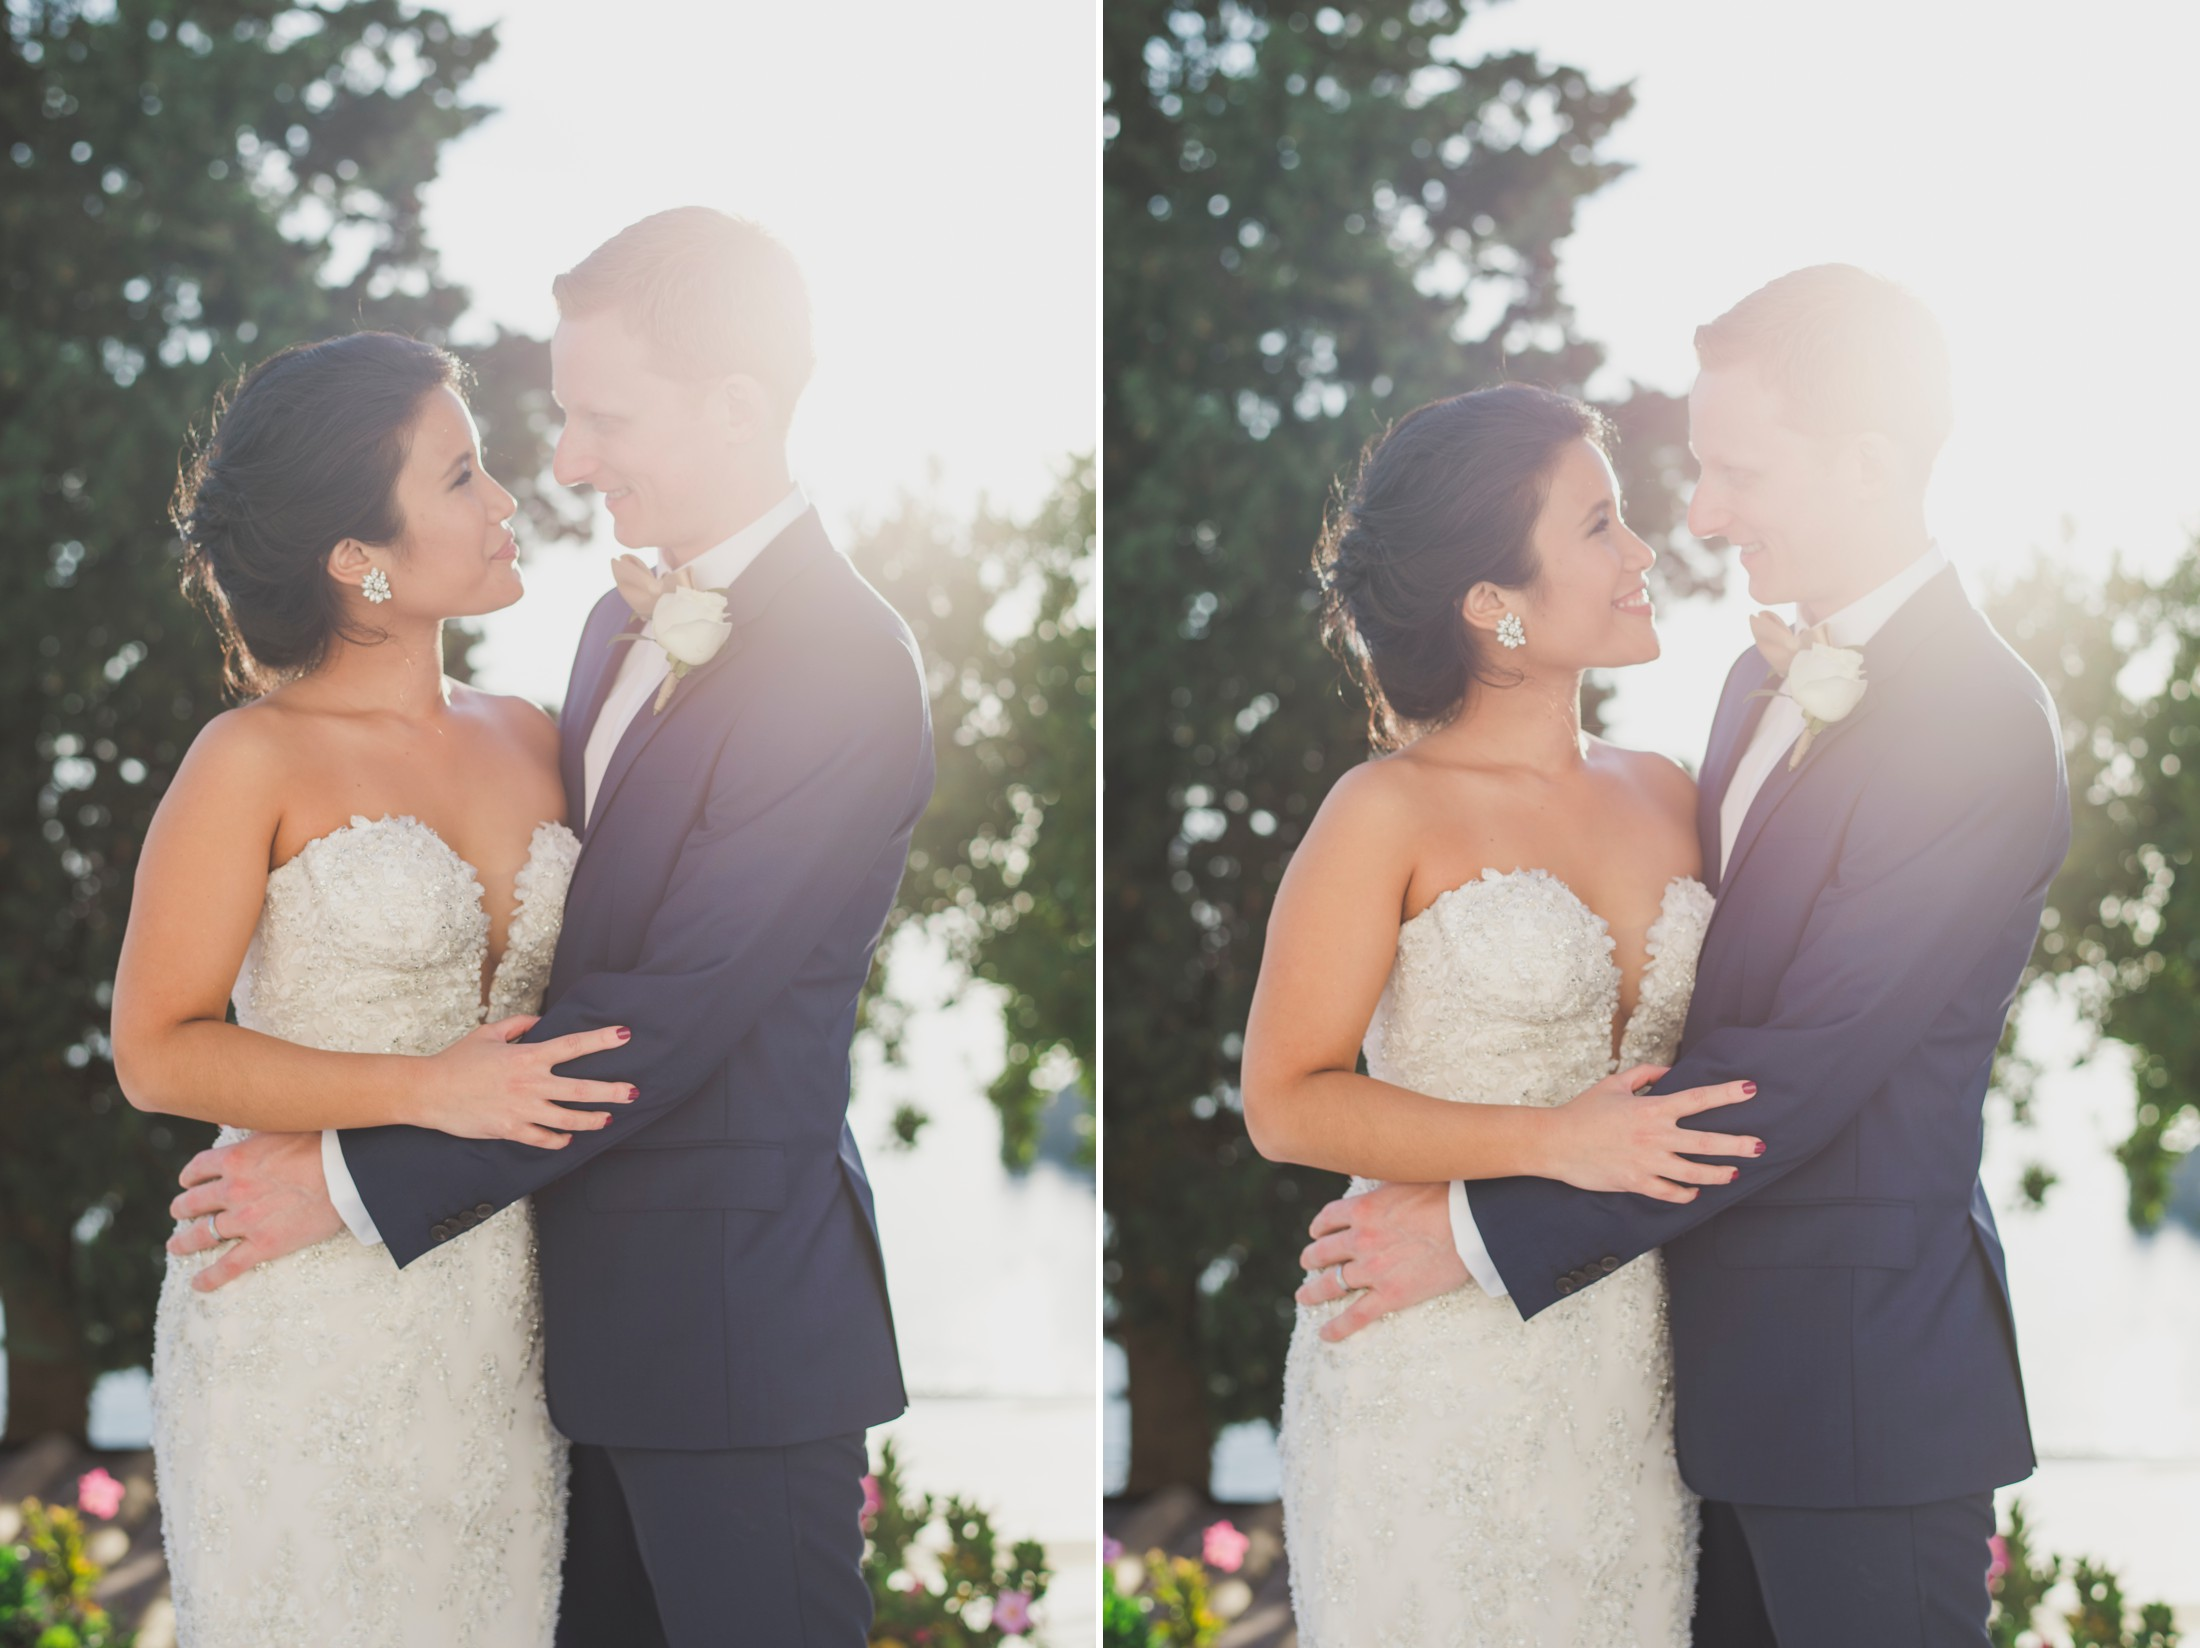 positano wedding collage bride and groom's portrait